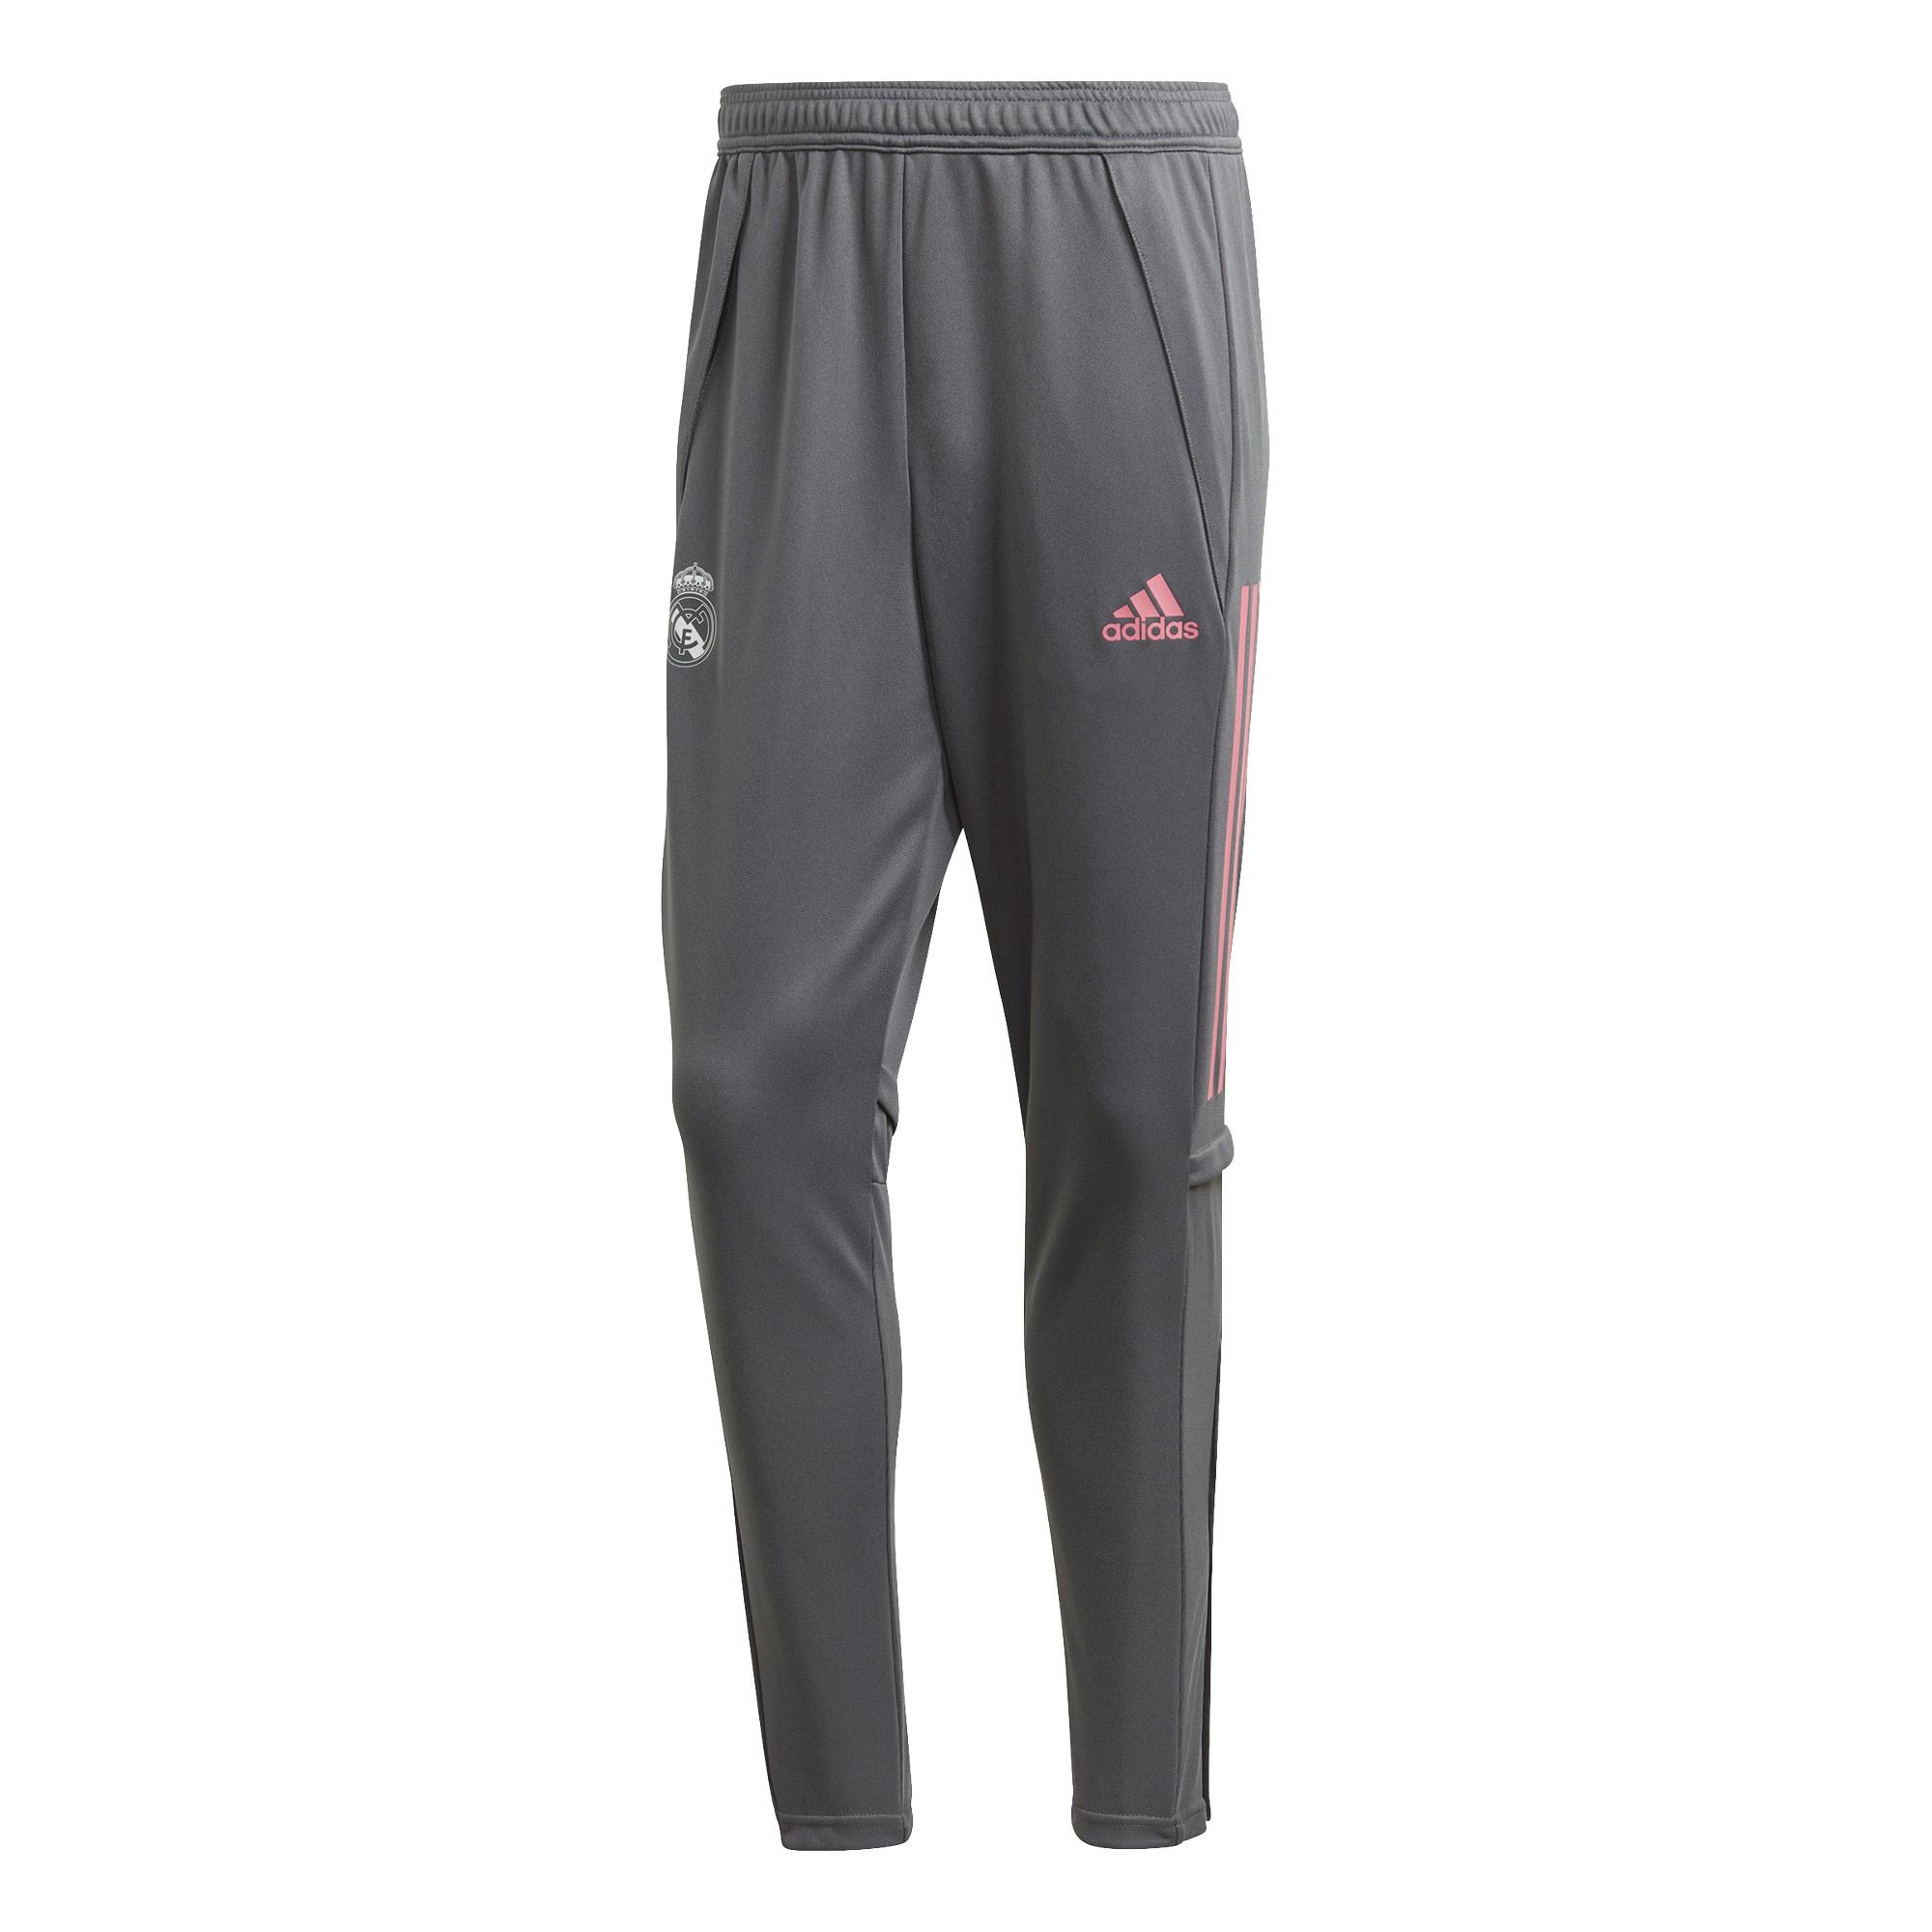 Adidas ADIDAS Real Madrid Training Pant